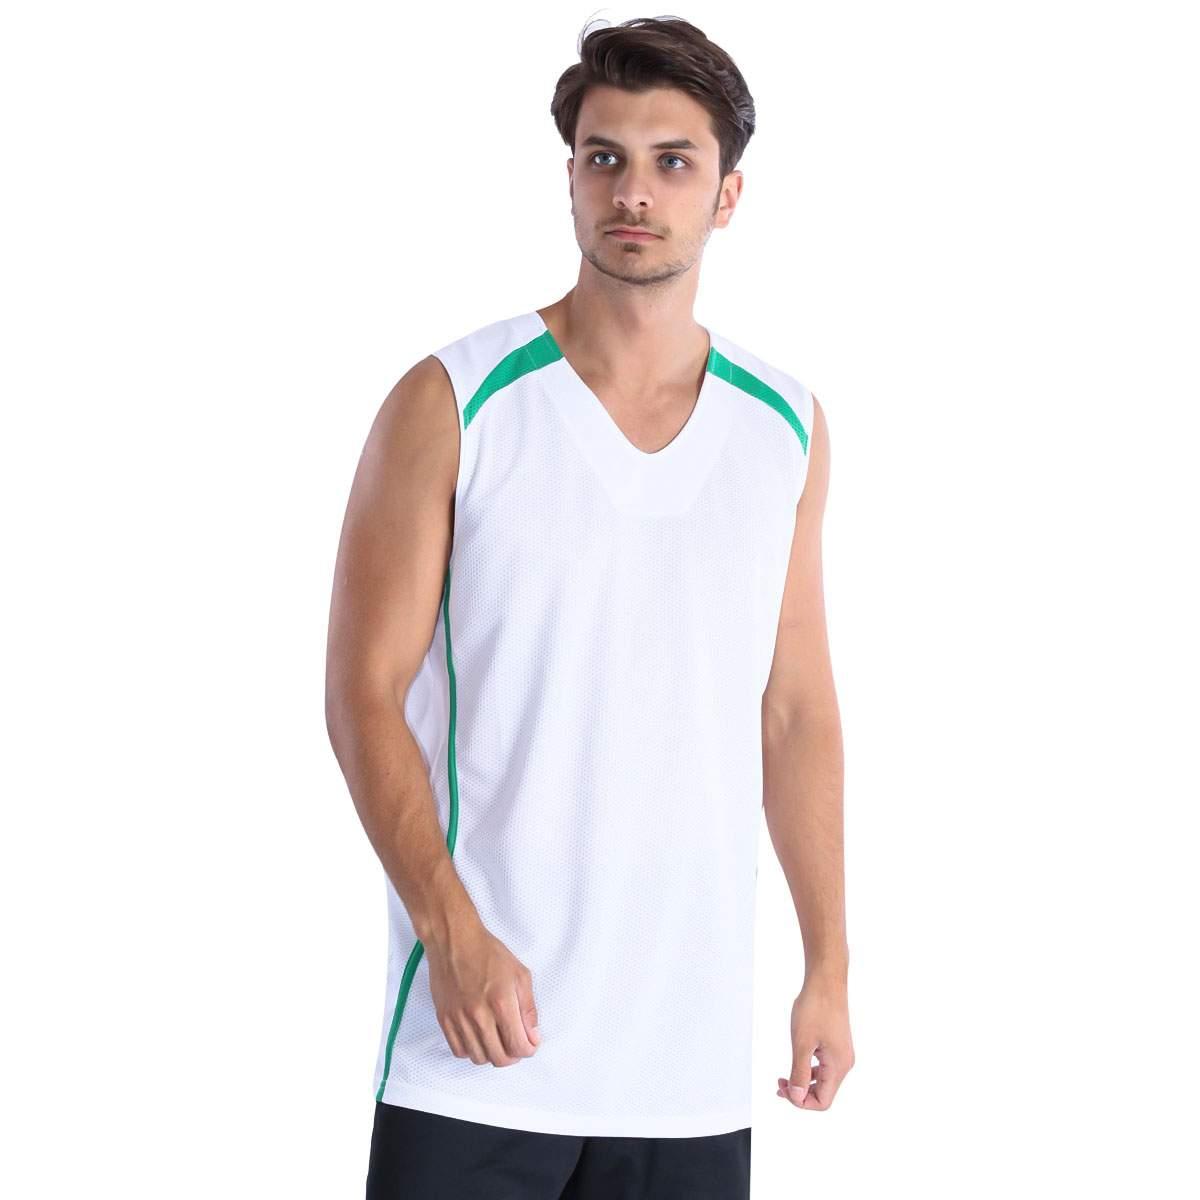 Sportive Eagle Erkek Beyaz Basketbol Forması 500022-0BY - 0BK - 0BX - 0KB